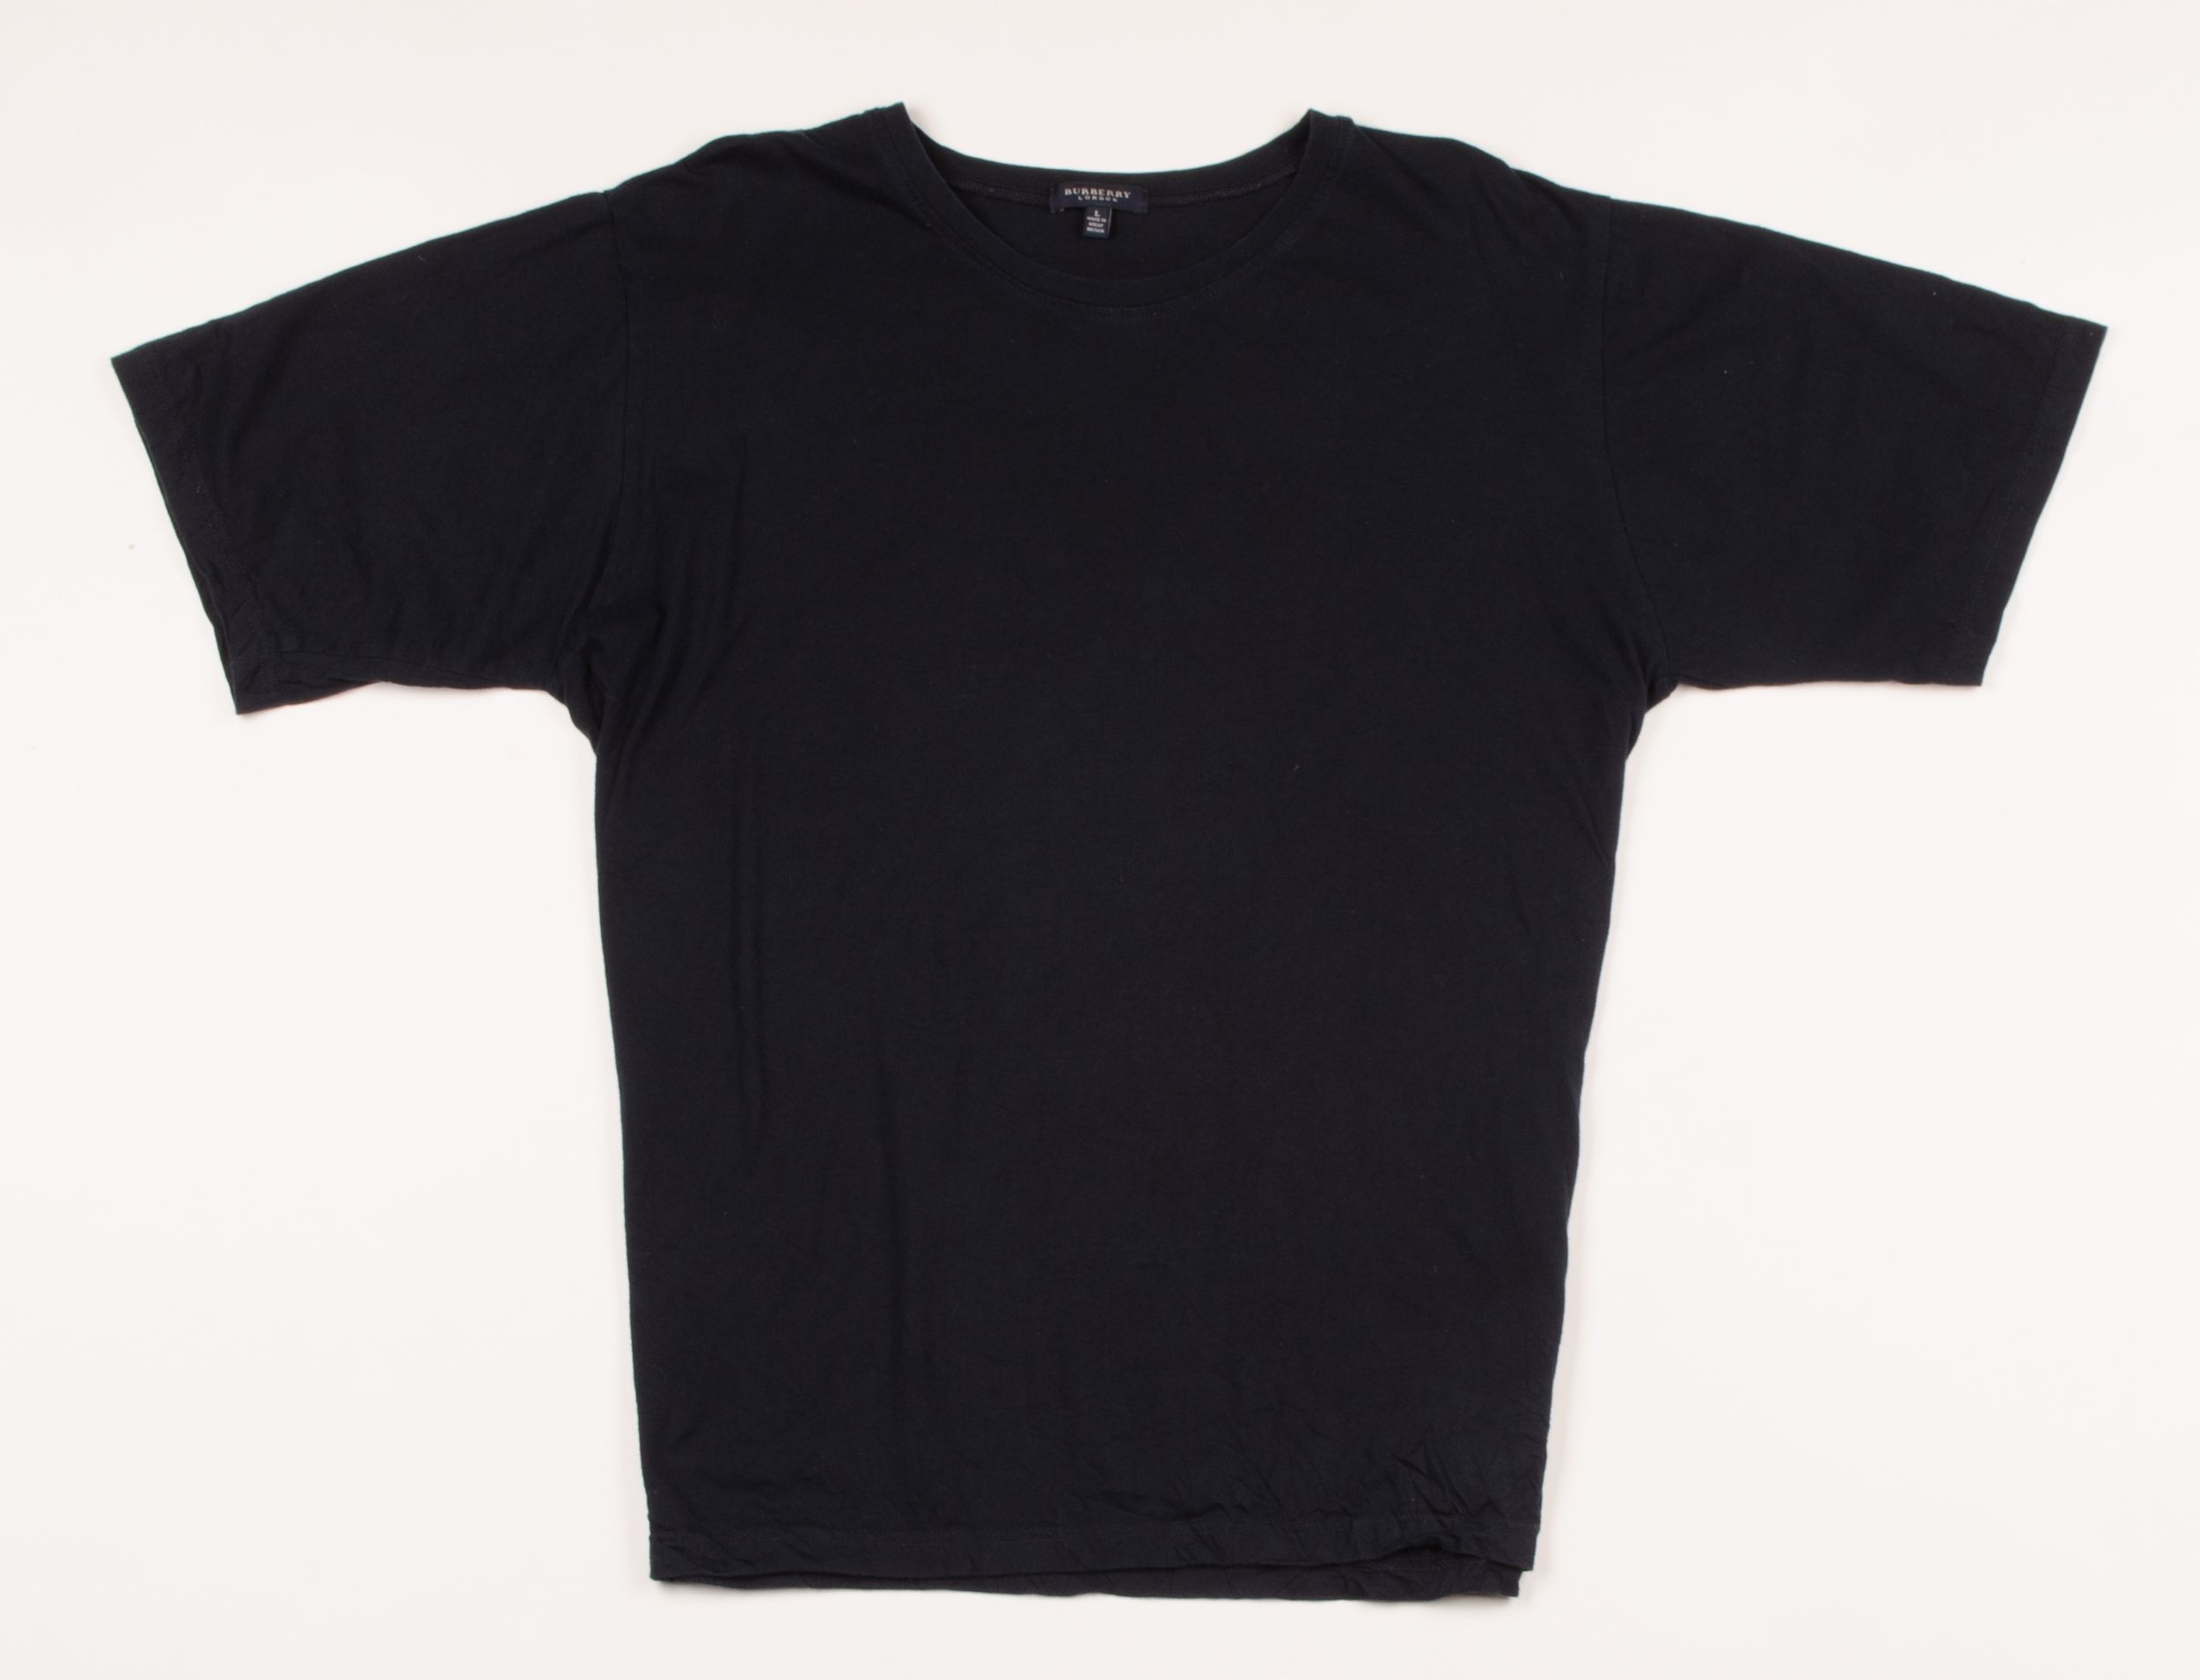 5a3055ebb 23879 Burberry T-shirt Koszulka Męska L - 7565070873 - oficjalne ...